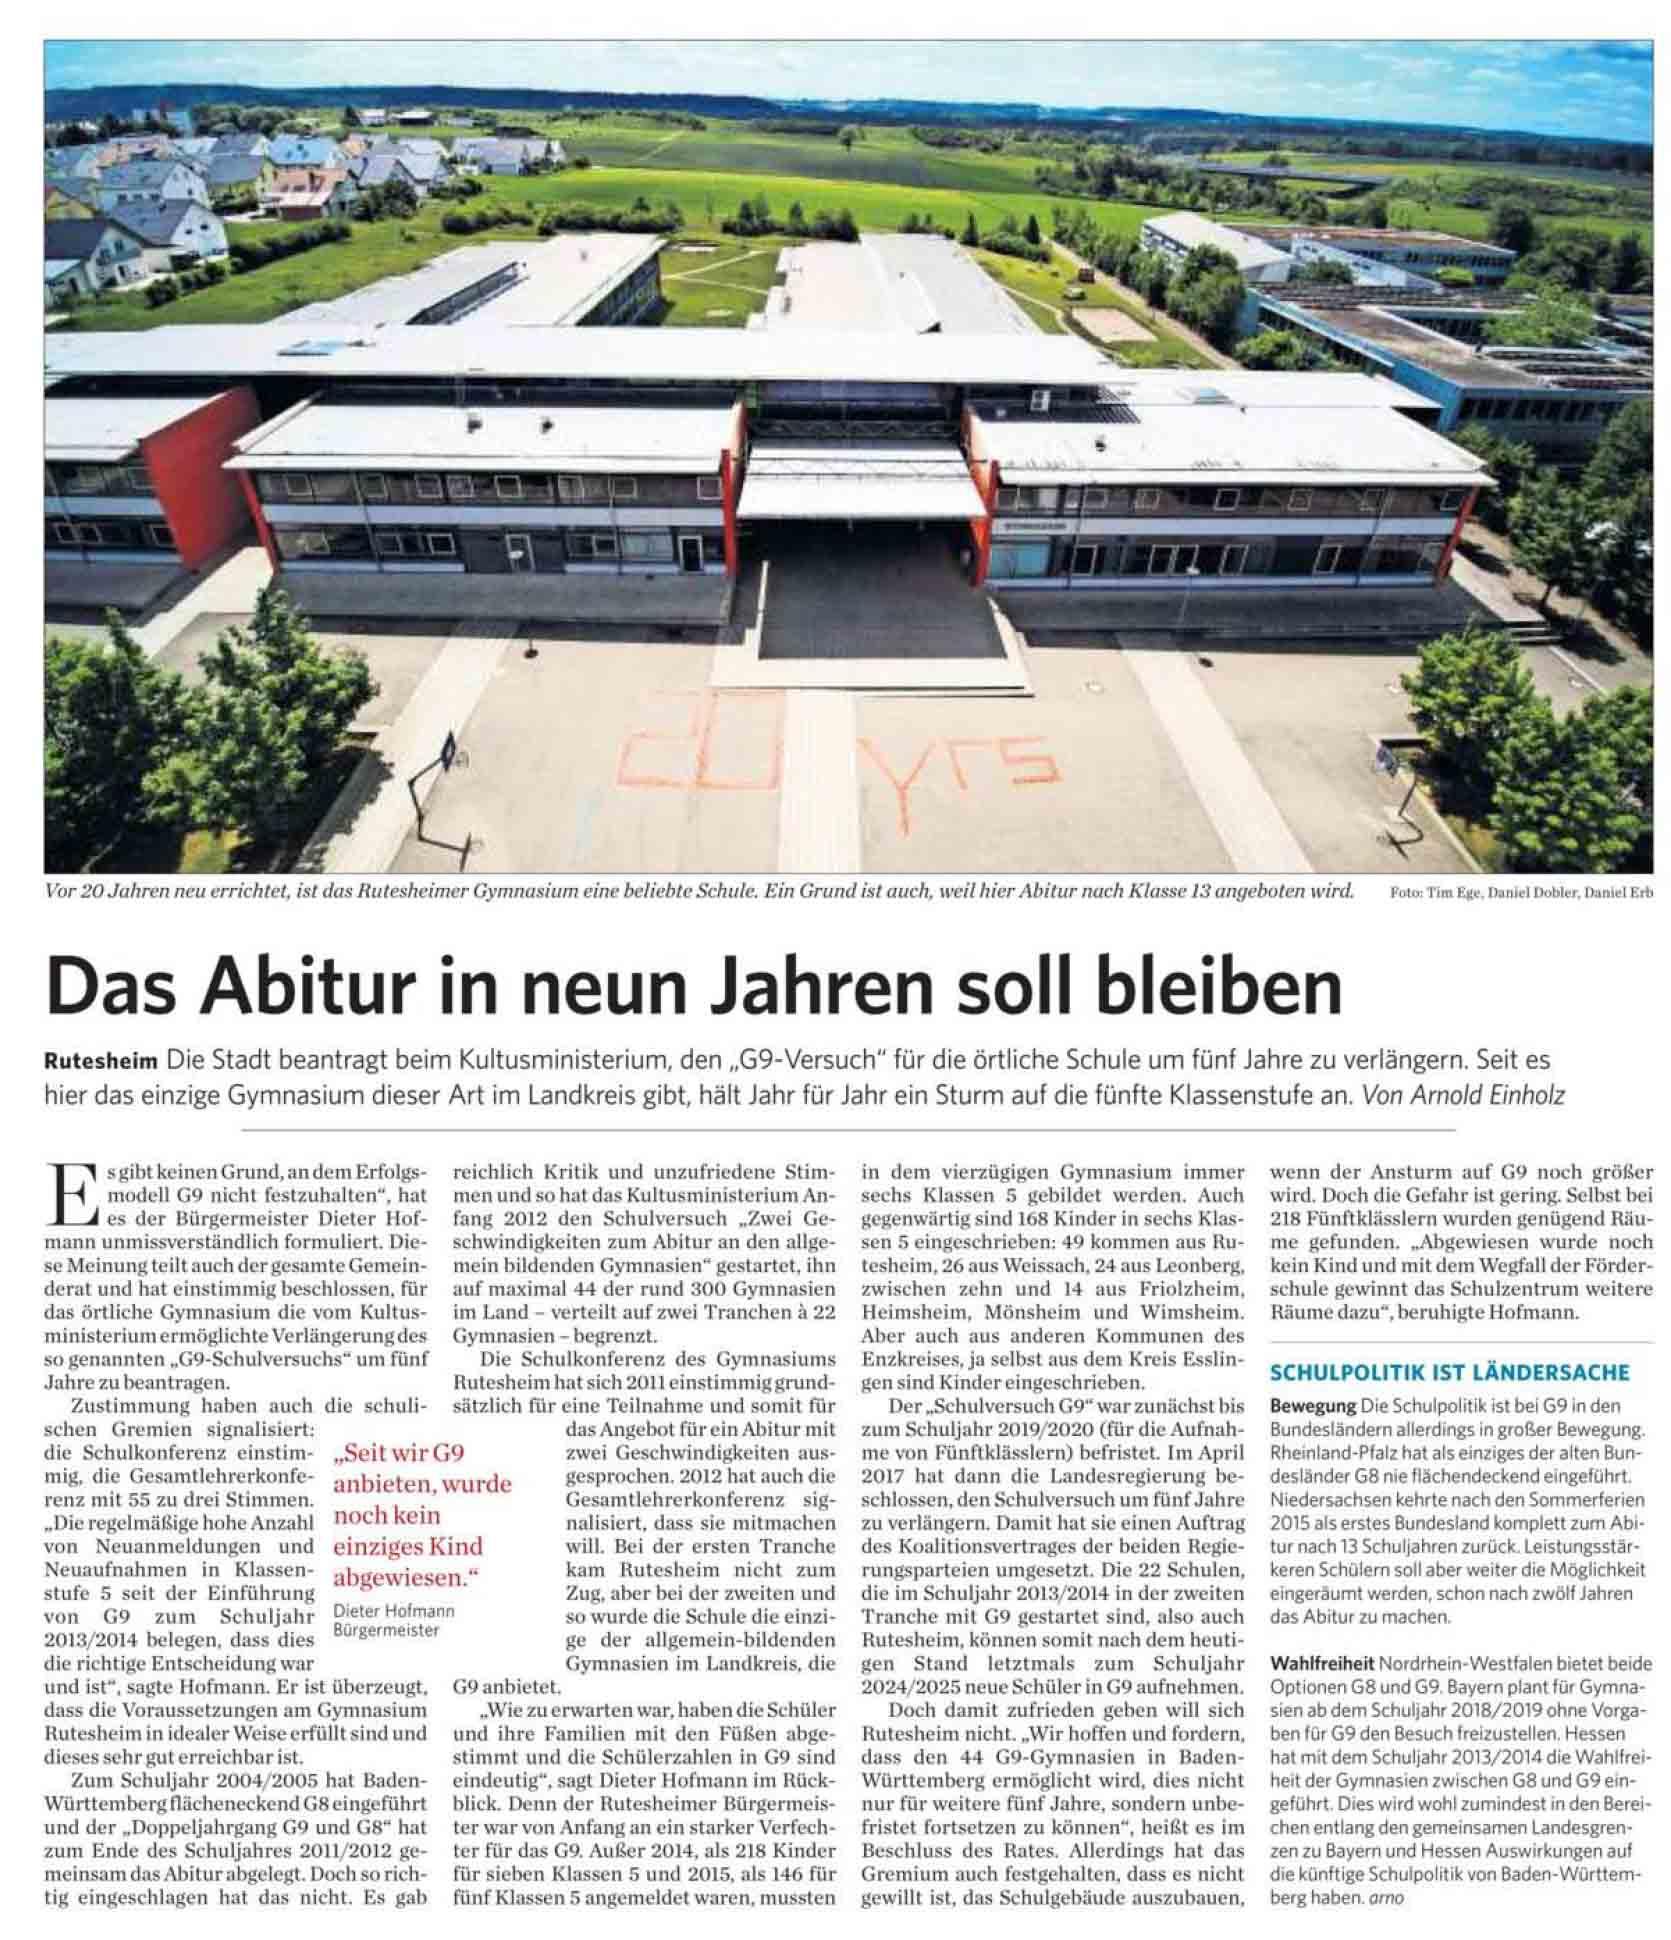 2017 10 05 Das Abitur in neun Jahren soll bleiben